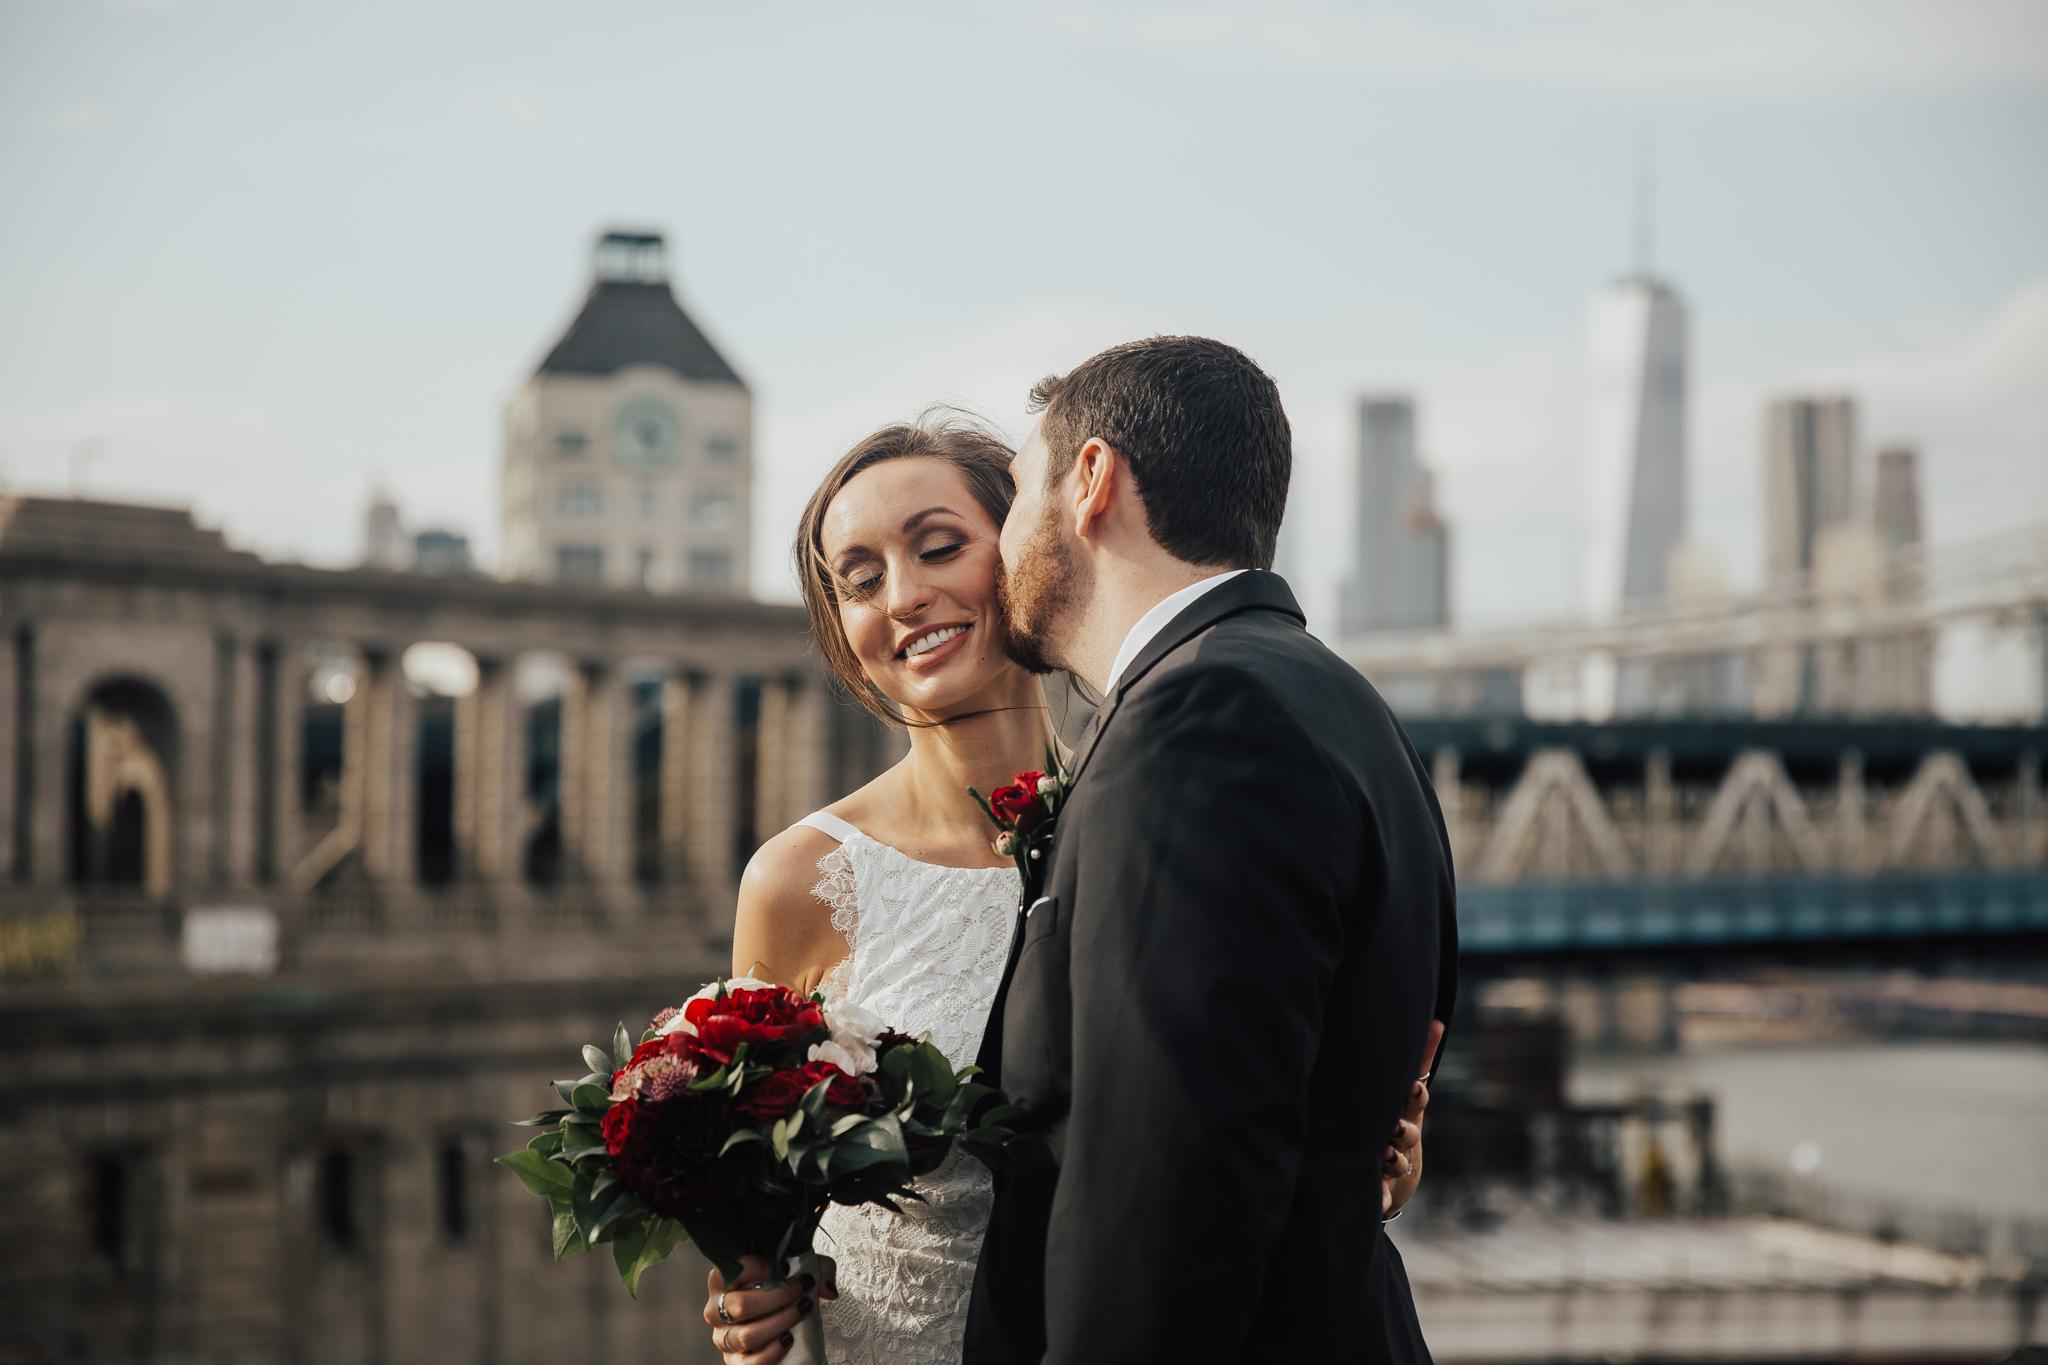 26-bridge-wedding-brooklyn-012.JPG